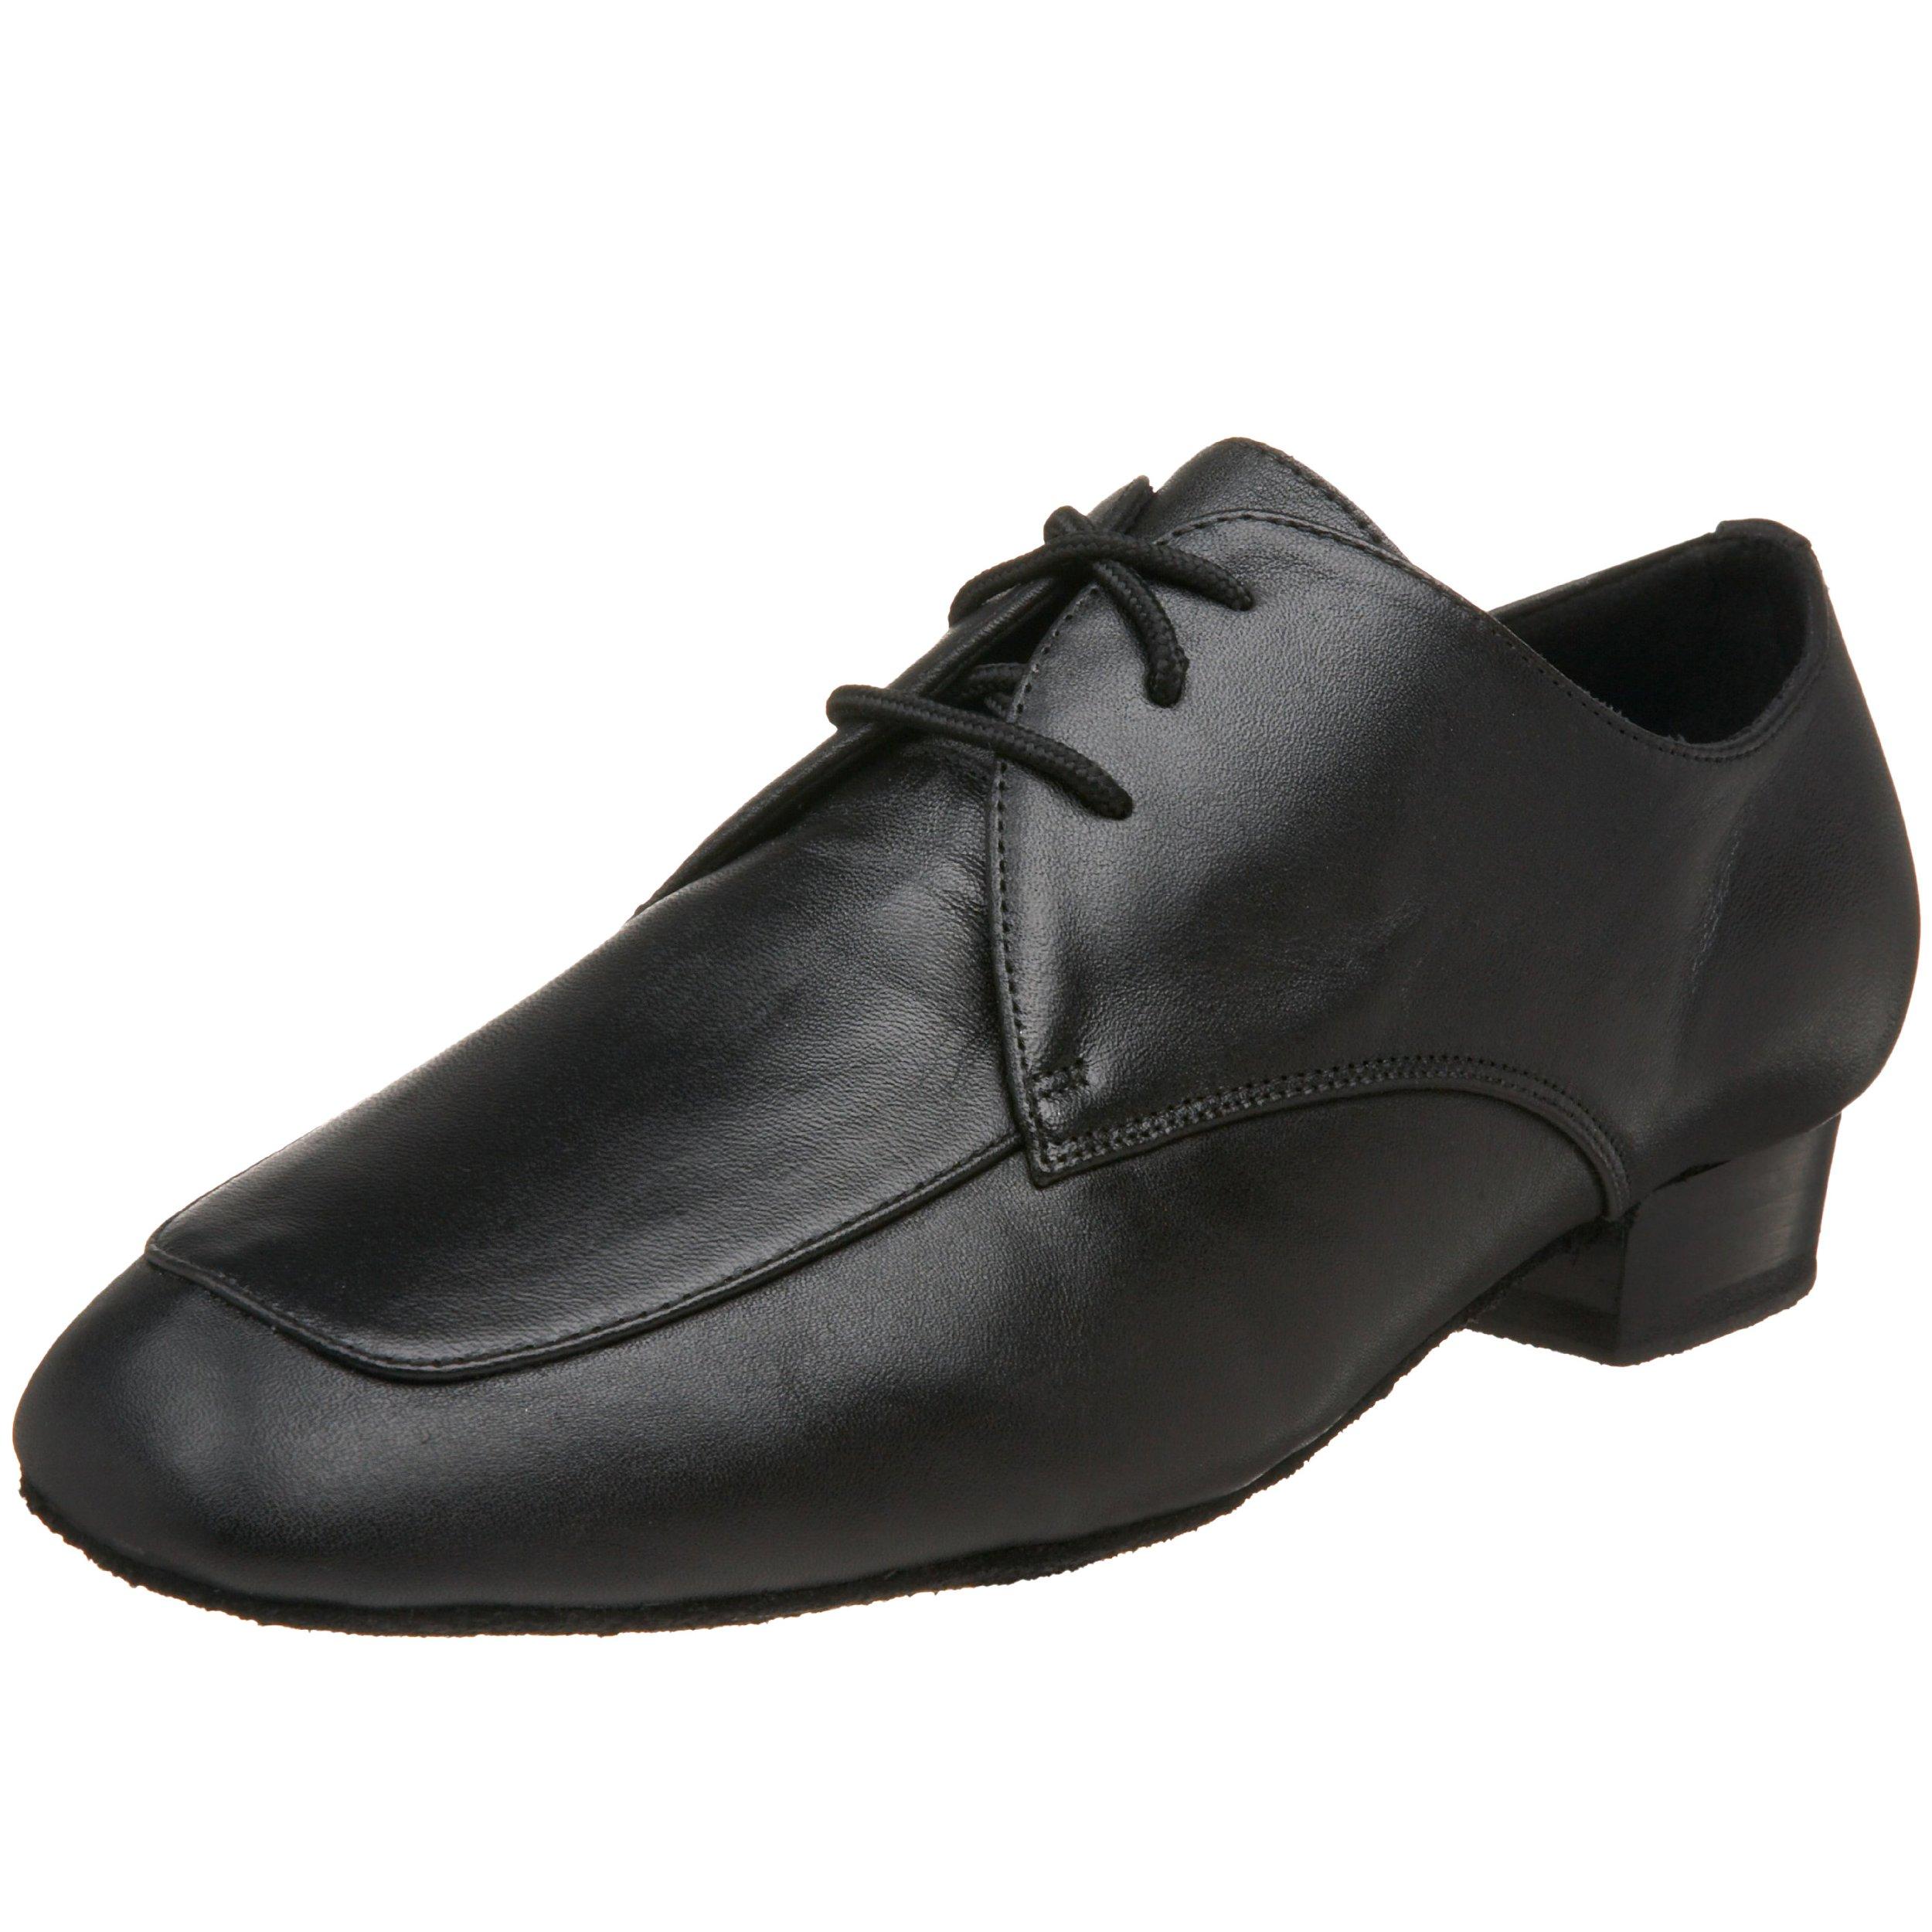 Capezio Men's Ben 1'' Ballroom Shoe,Black,10.5 W US